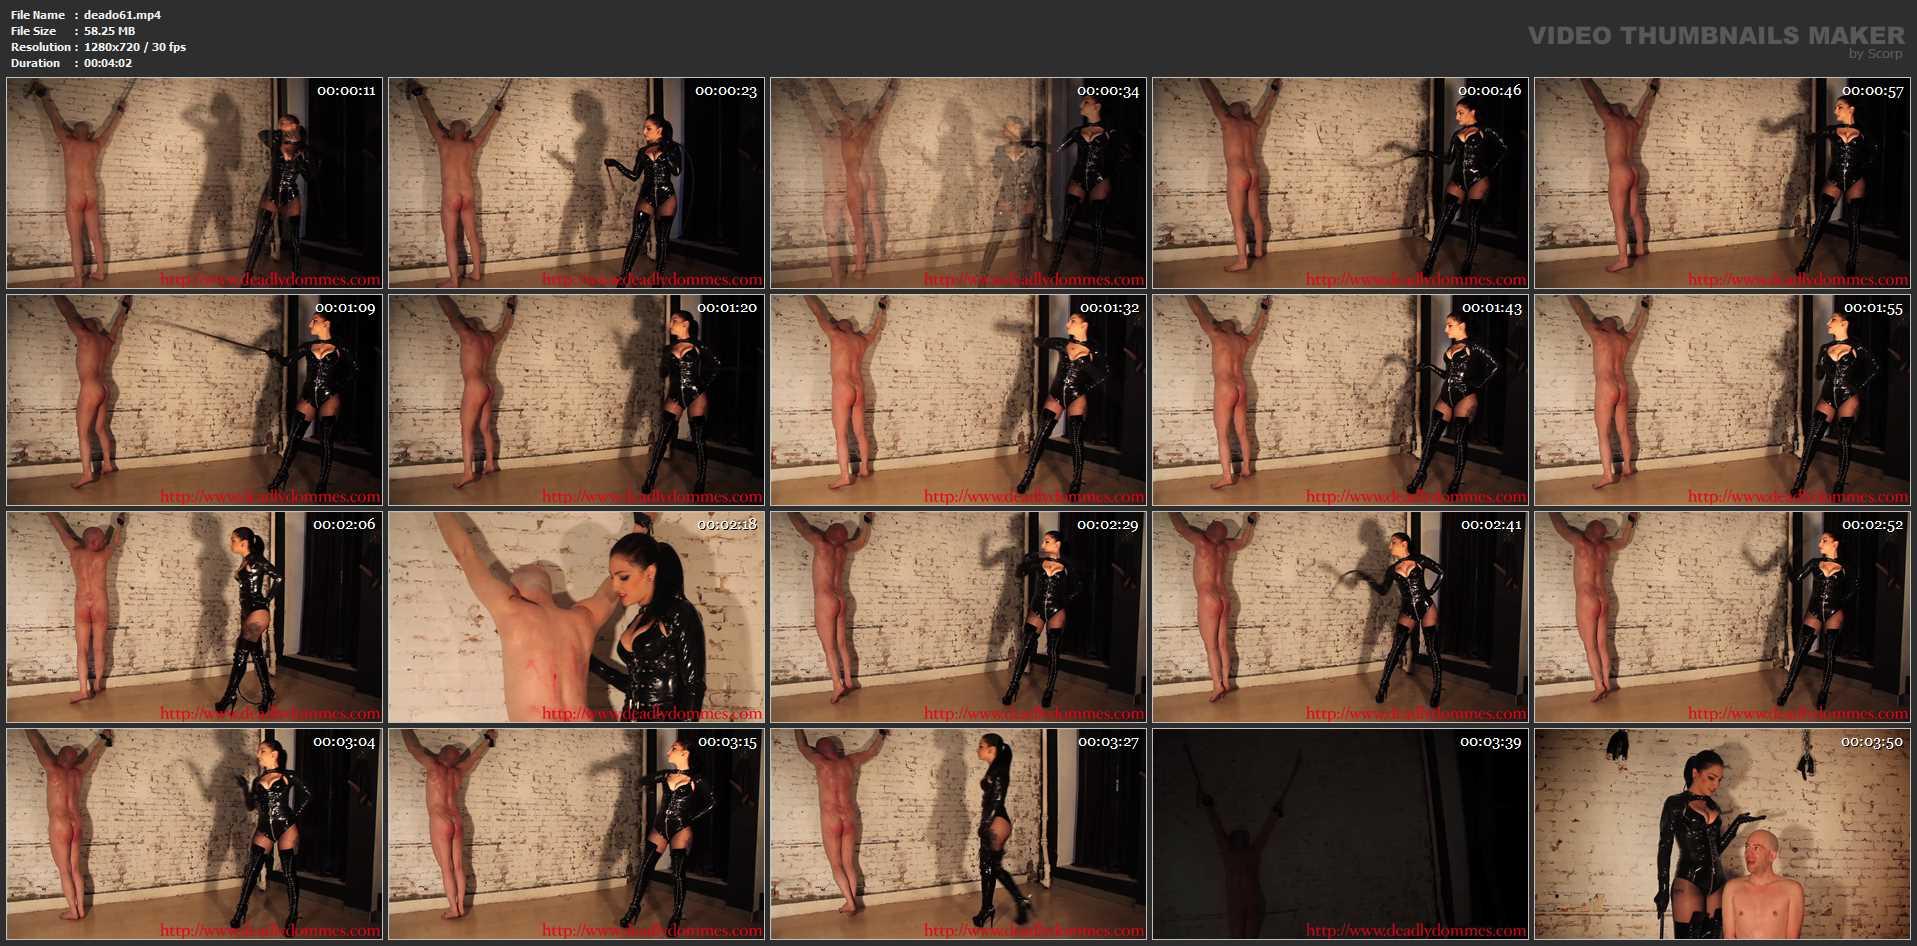 Mistress Cracks The Whip - DEADLYDOMMES - HD/720p/MP4